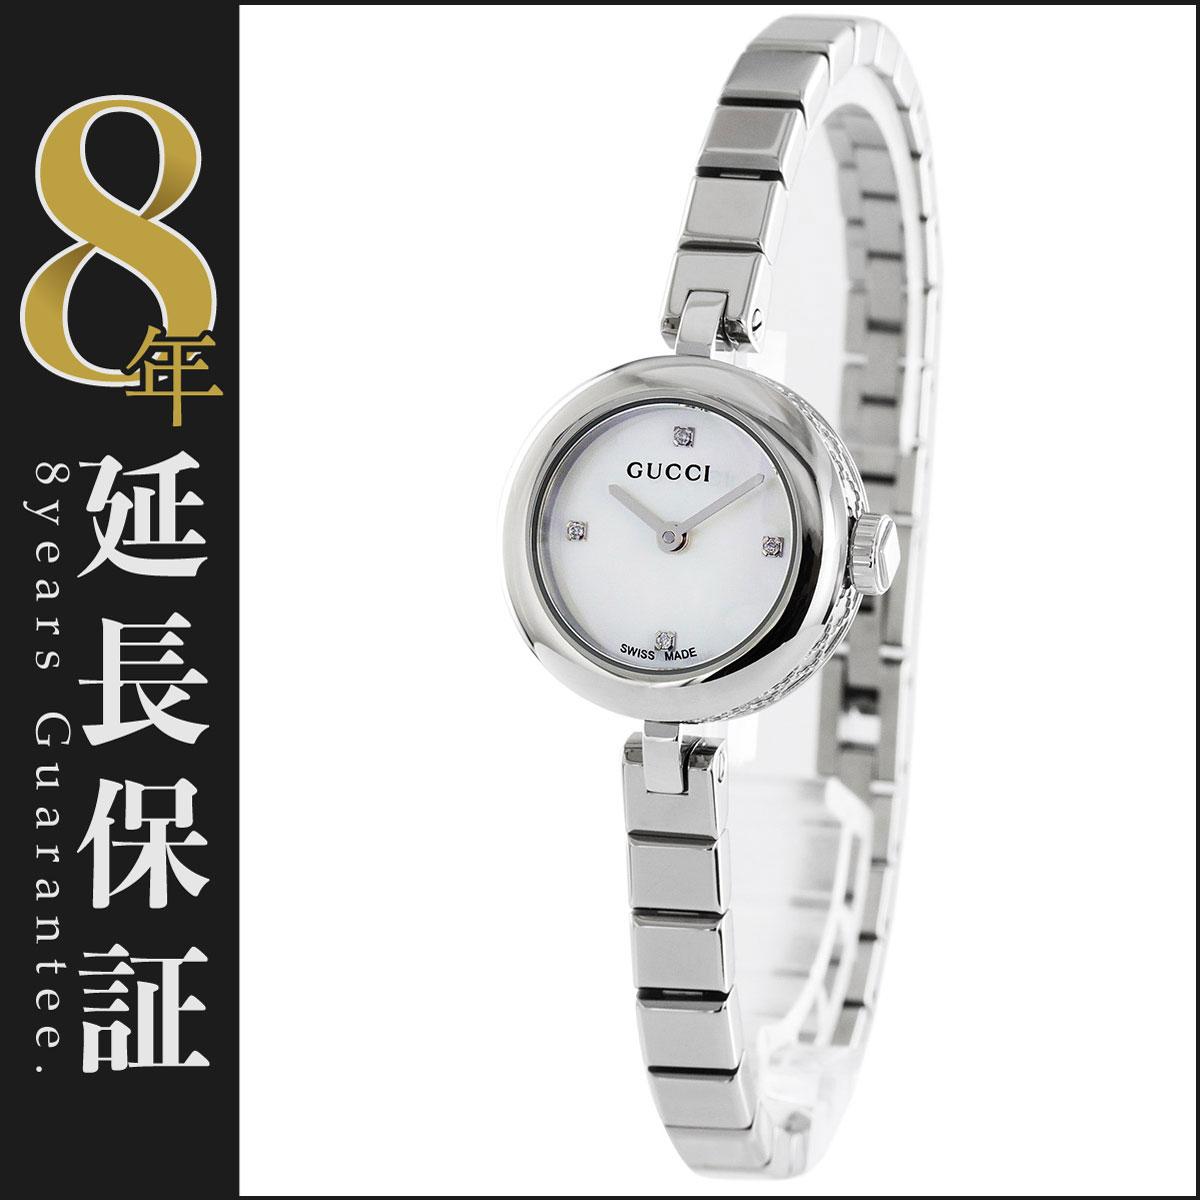 07a03fa667c9e5 GUCCI グッチ ダイヤ 腕時計 ディアマンティッシマ YA141503_8 レディース